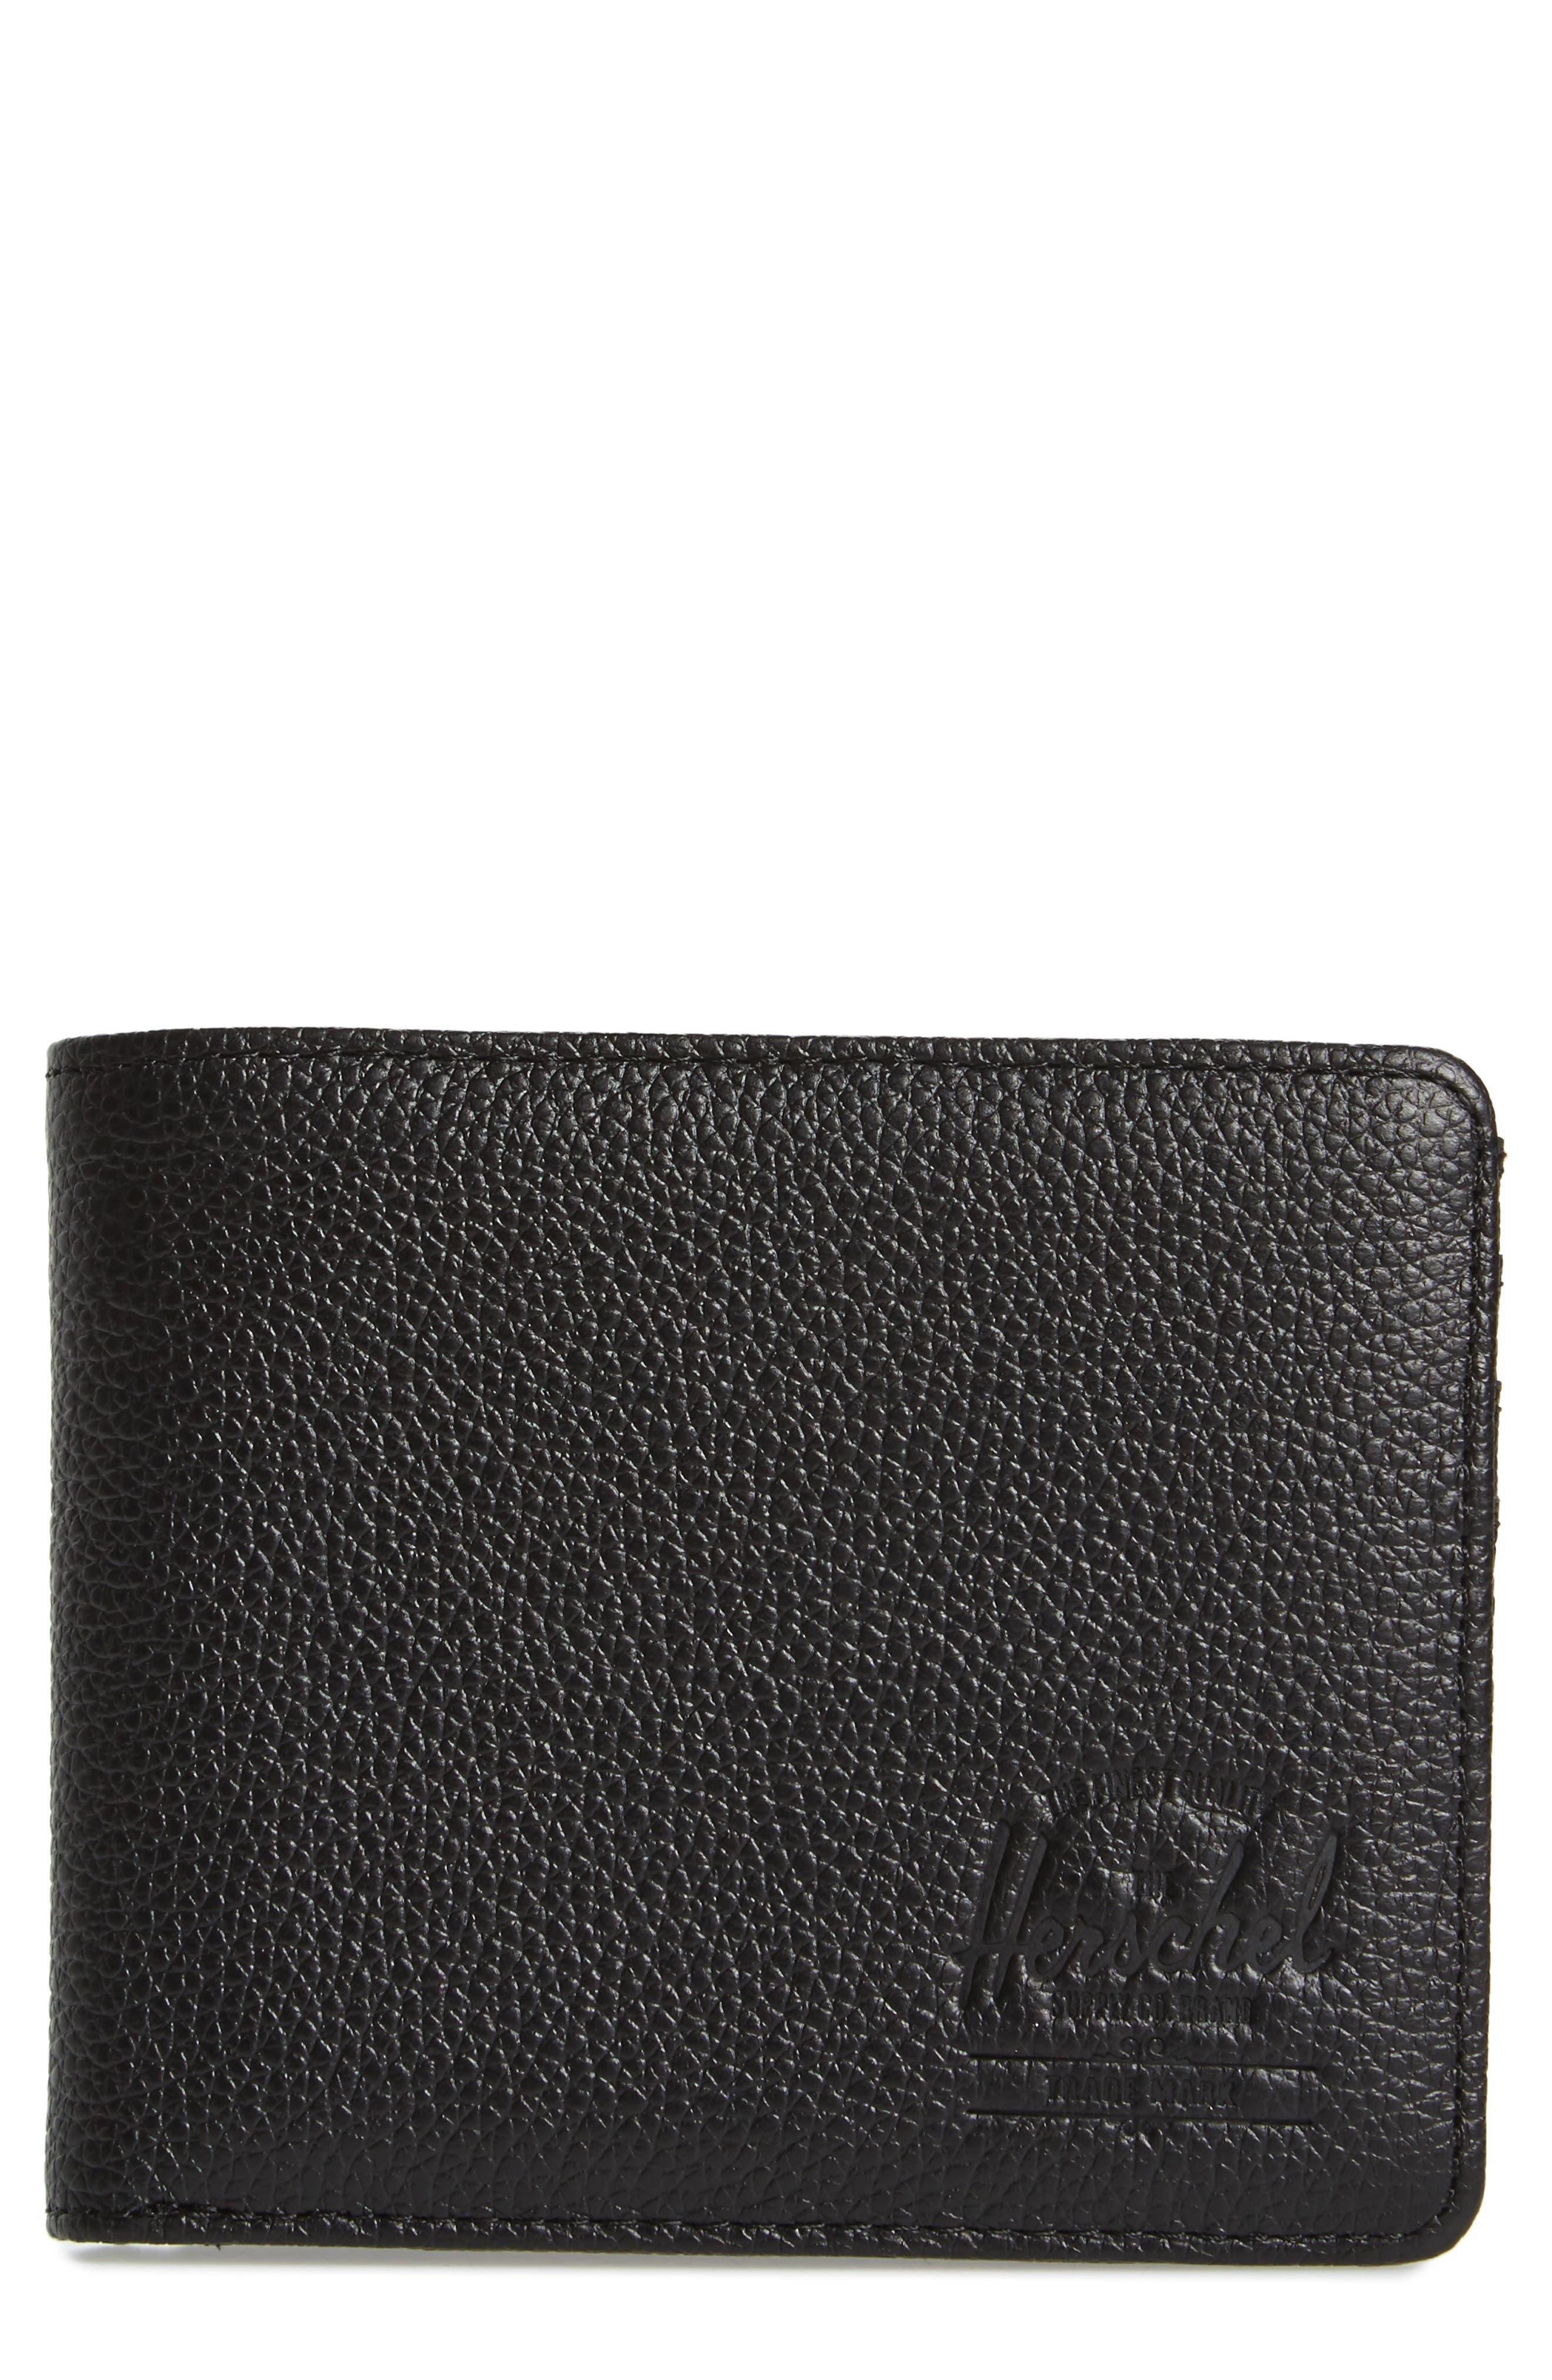 Alternate Image 1 Selected - Herschel Supply Co. Tile Roy Leather Bifold Wallet